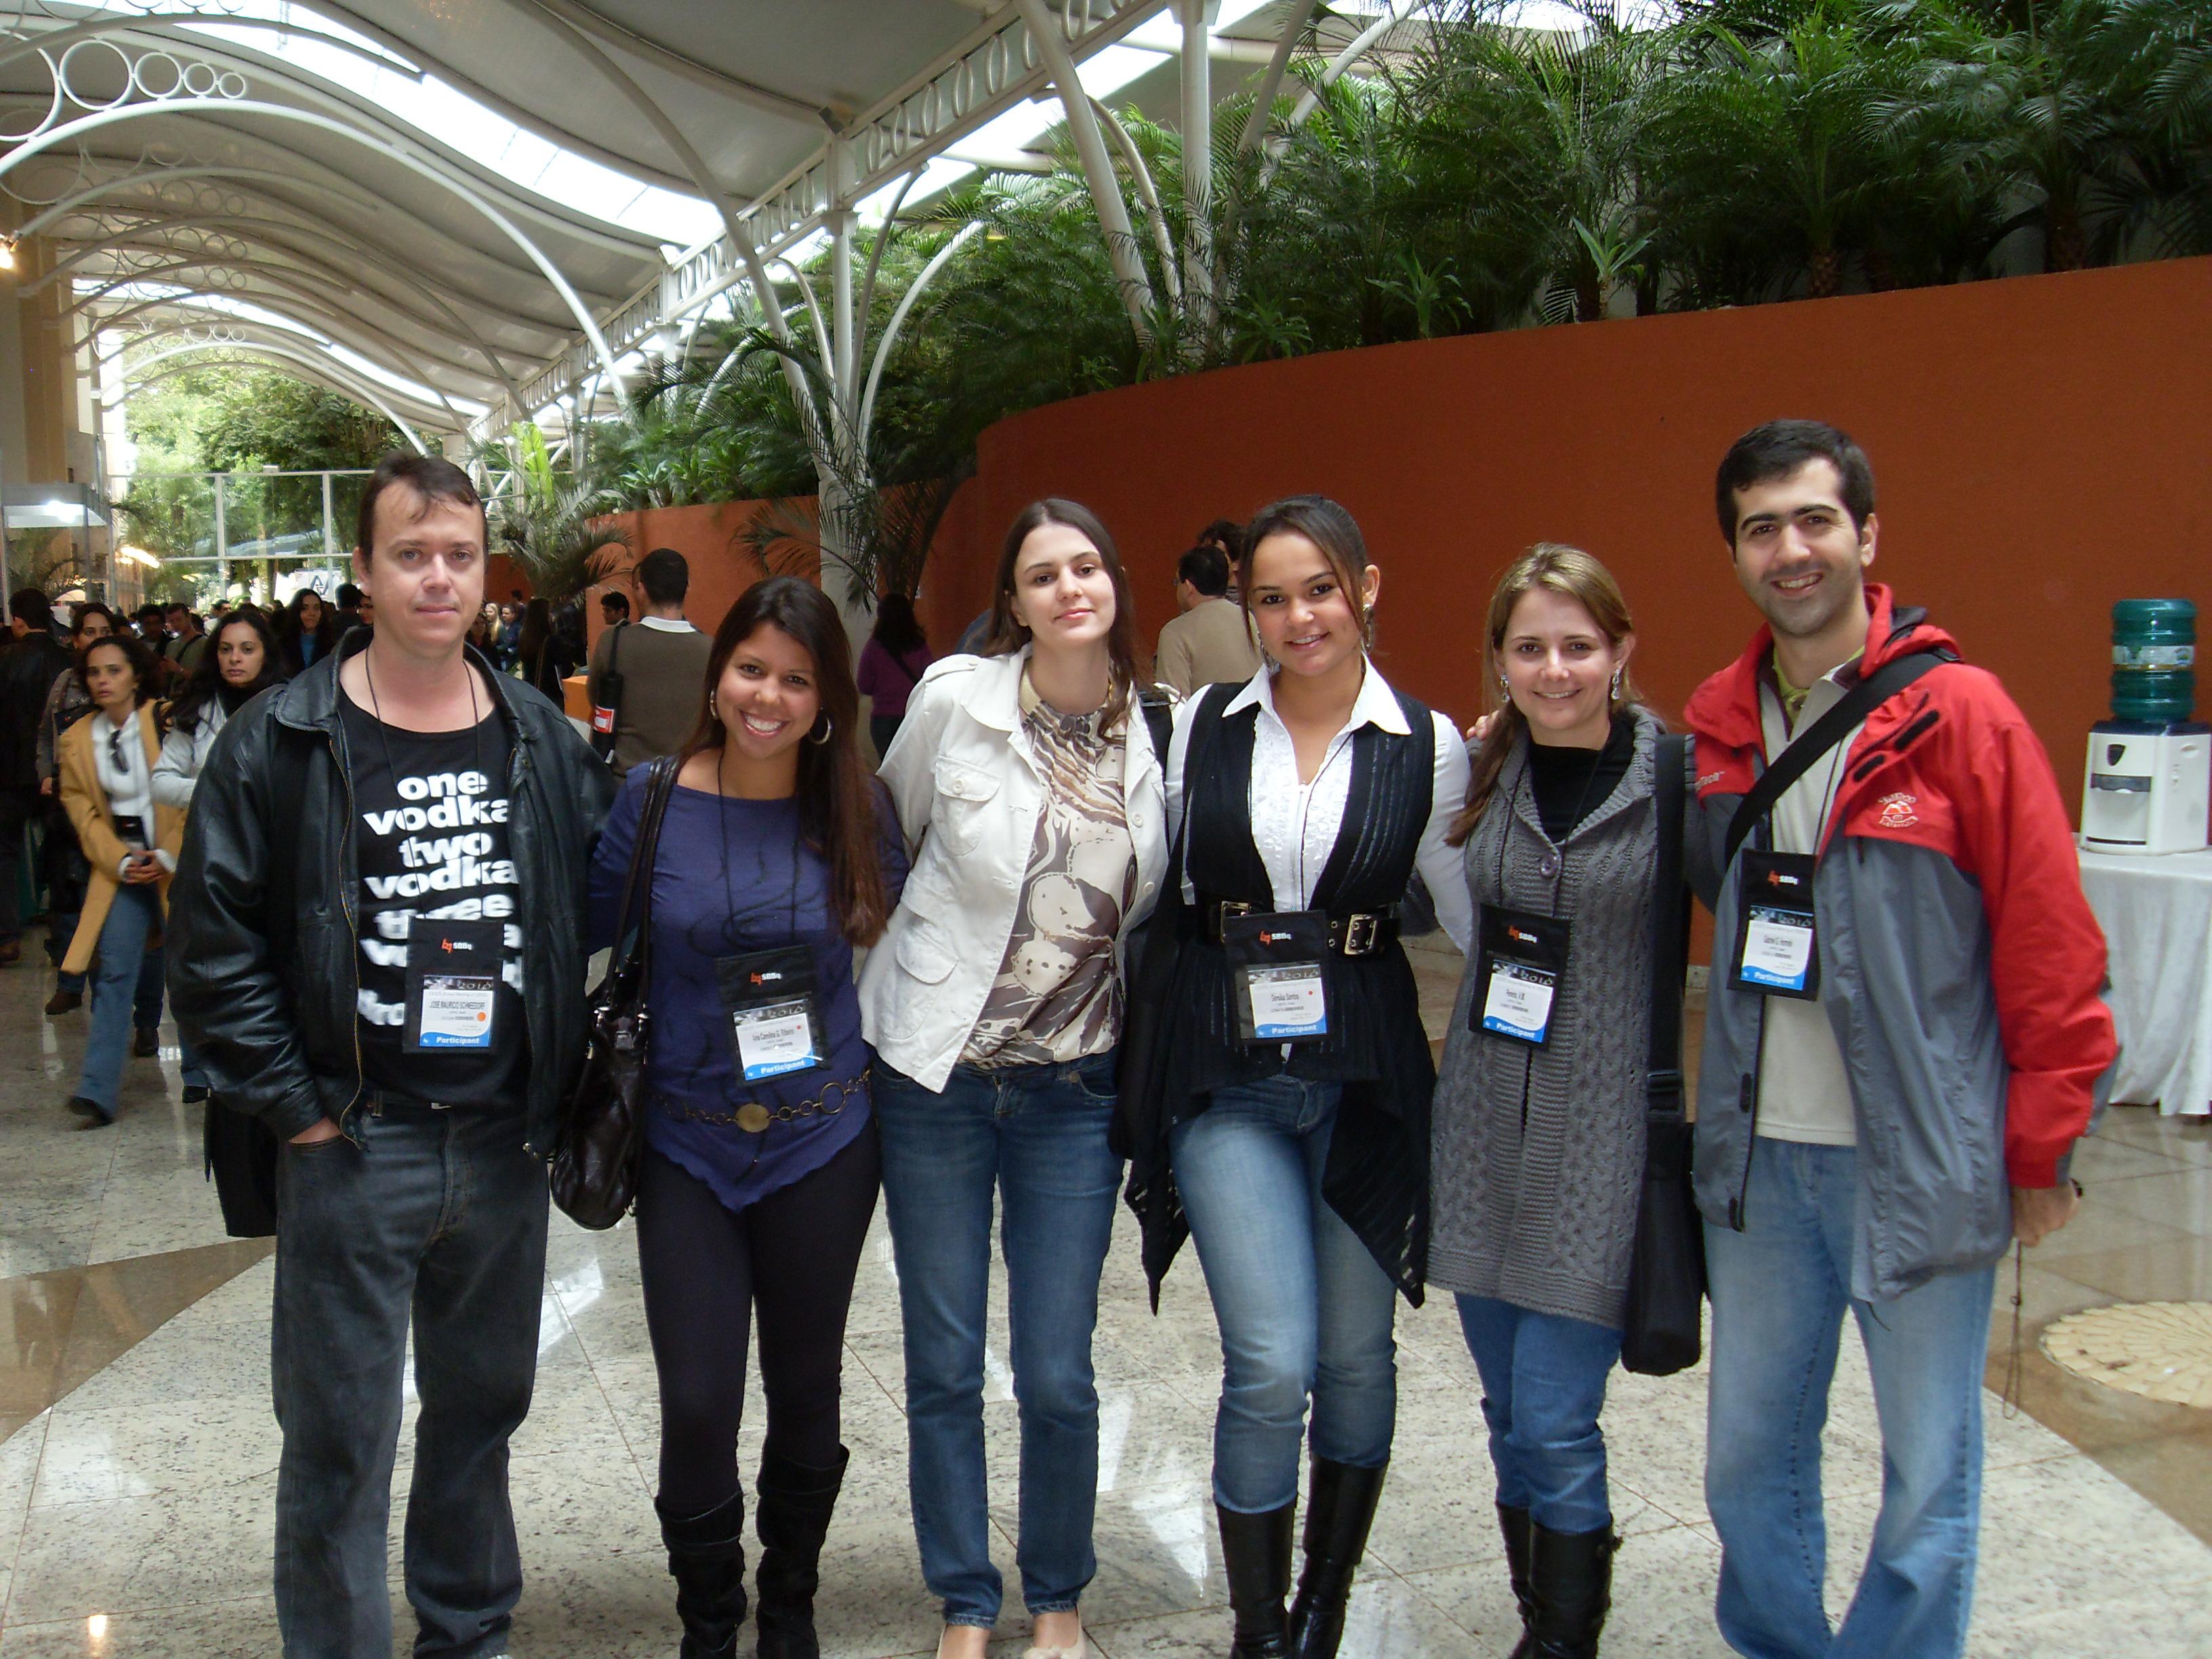 Grupo na Sbbq 2010